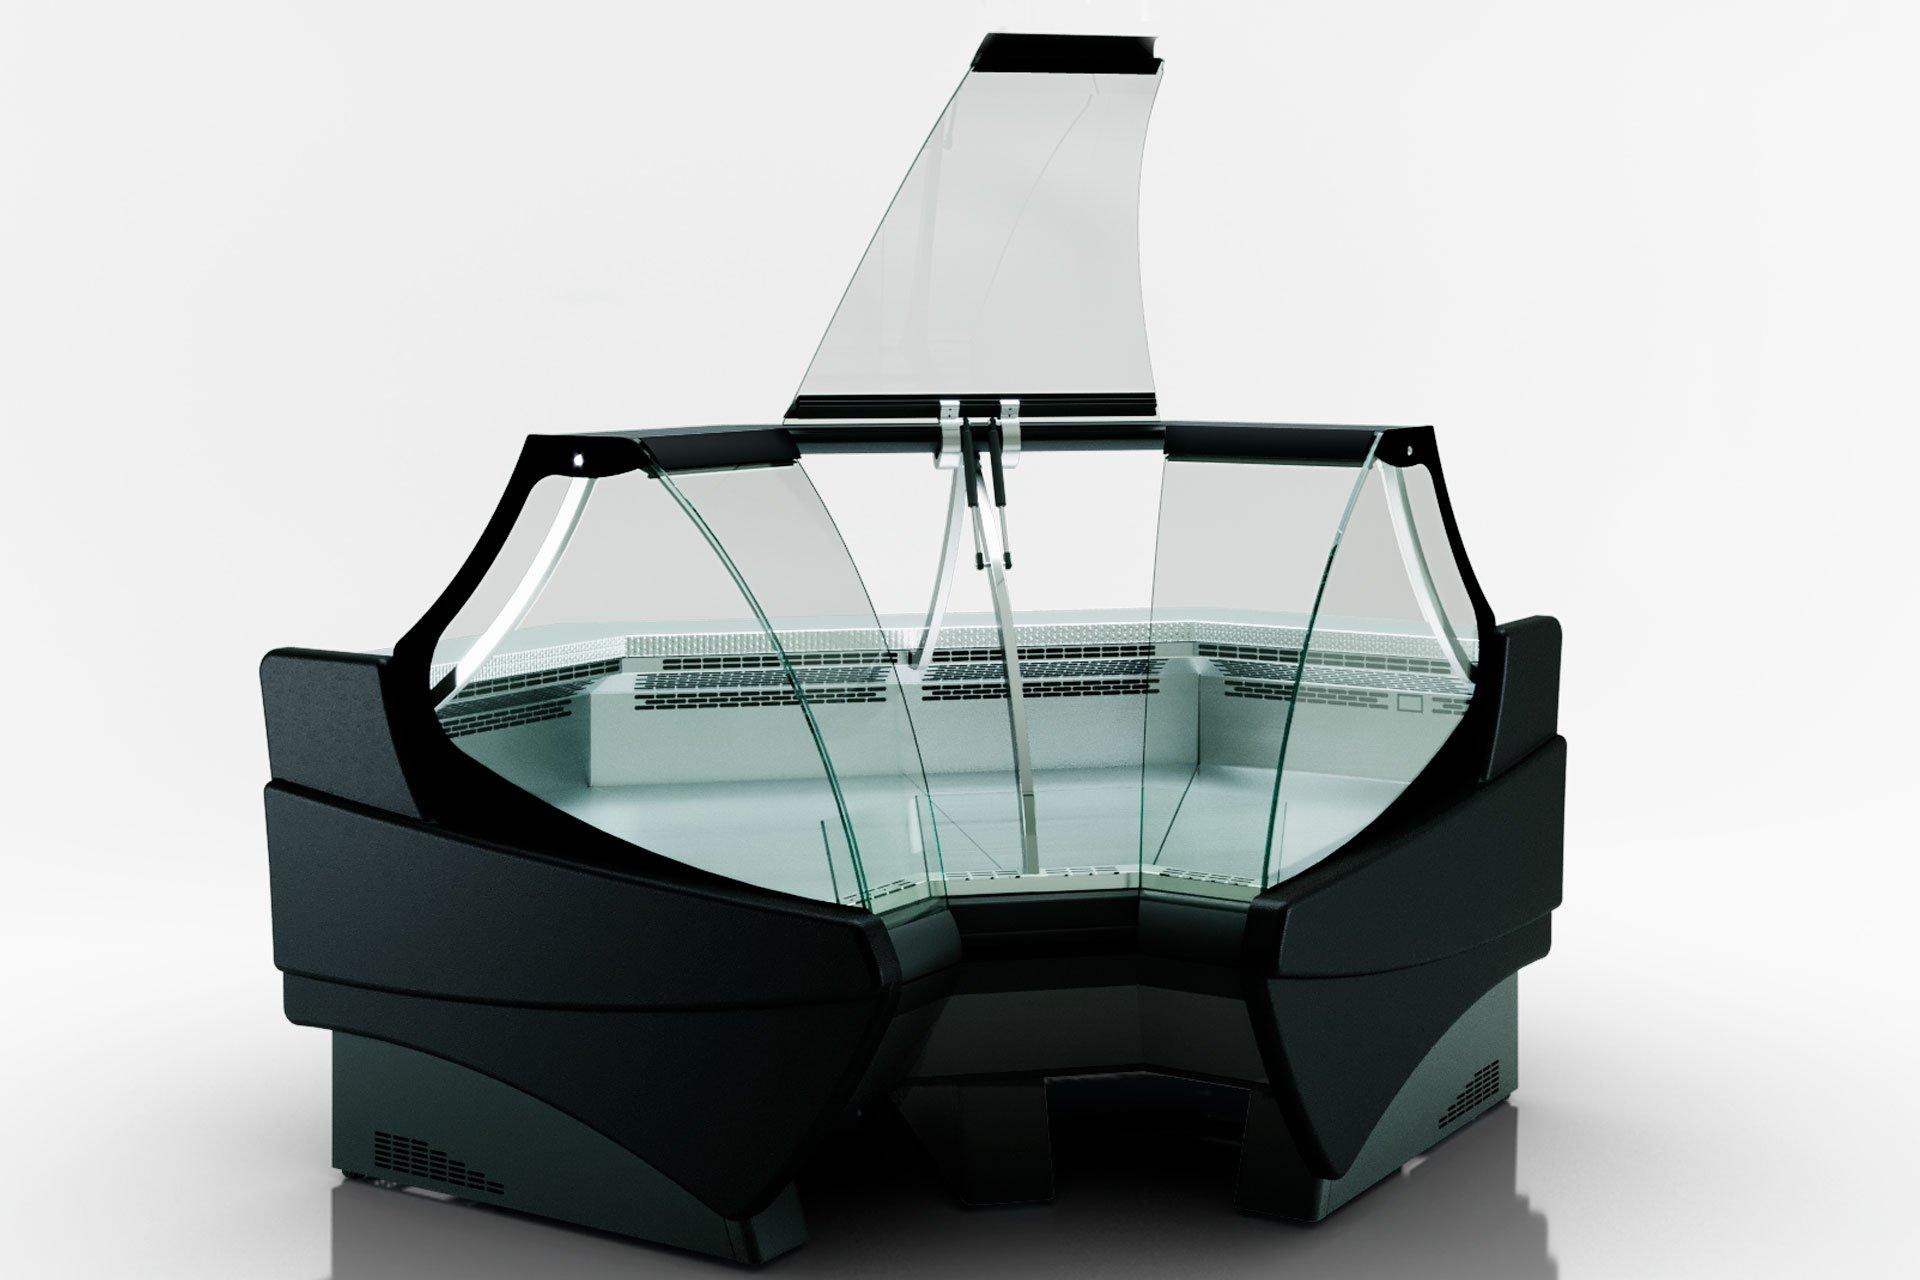 Вітрина Symphony luxe MG 120 deli PS 125-DLM-IS90